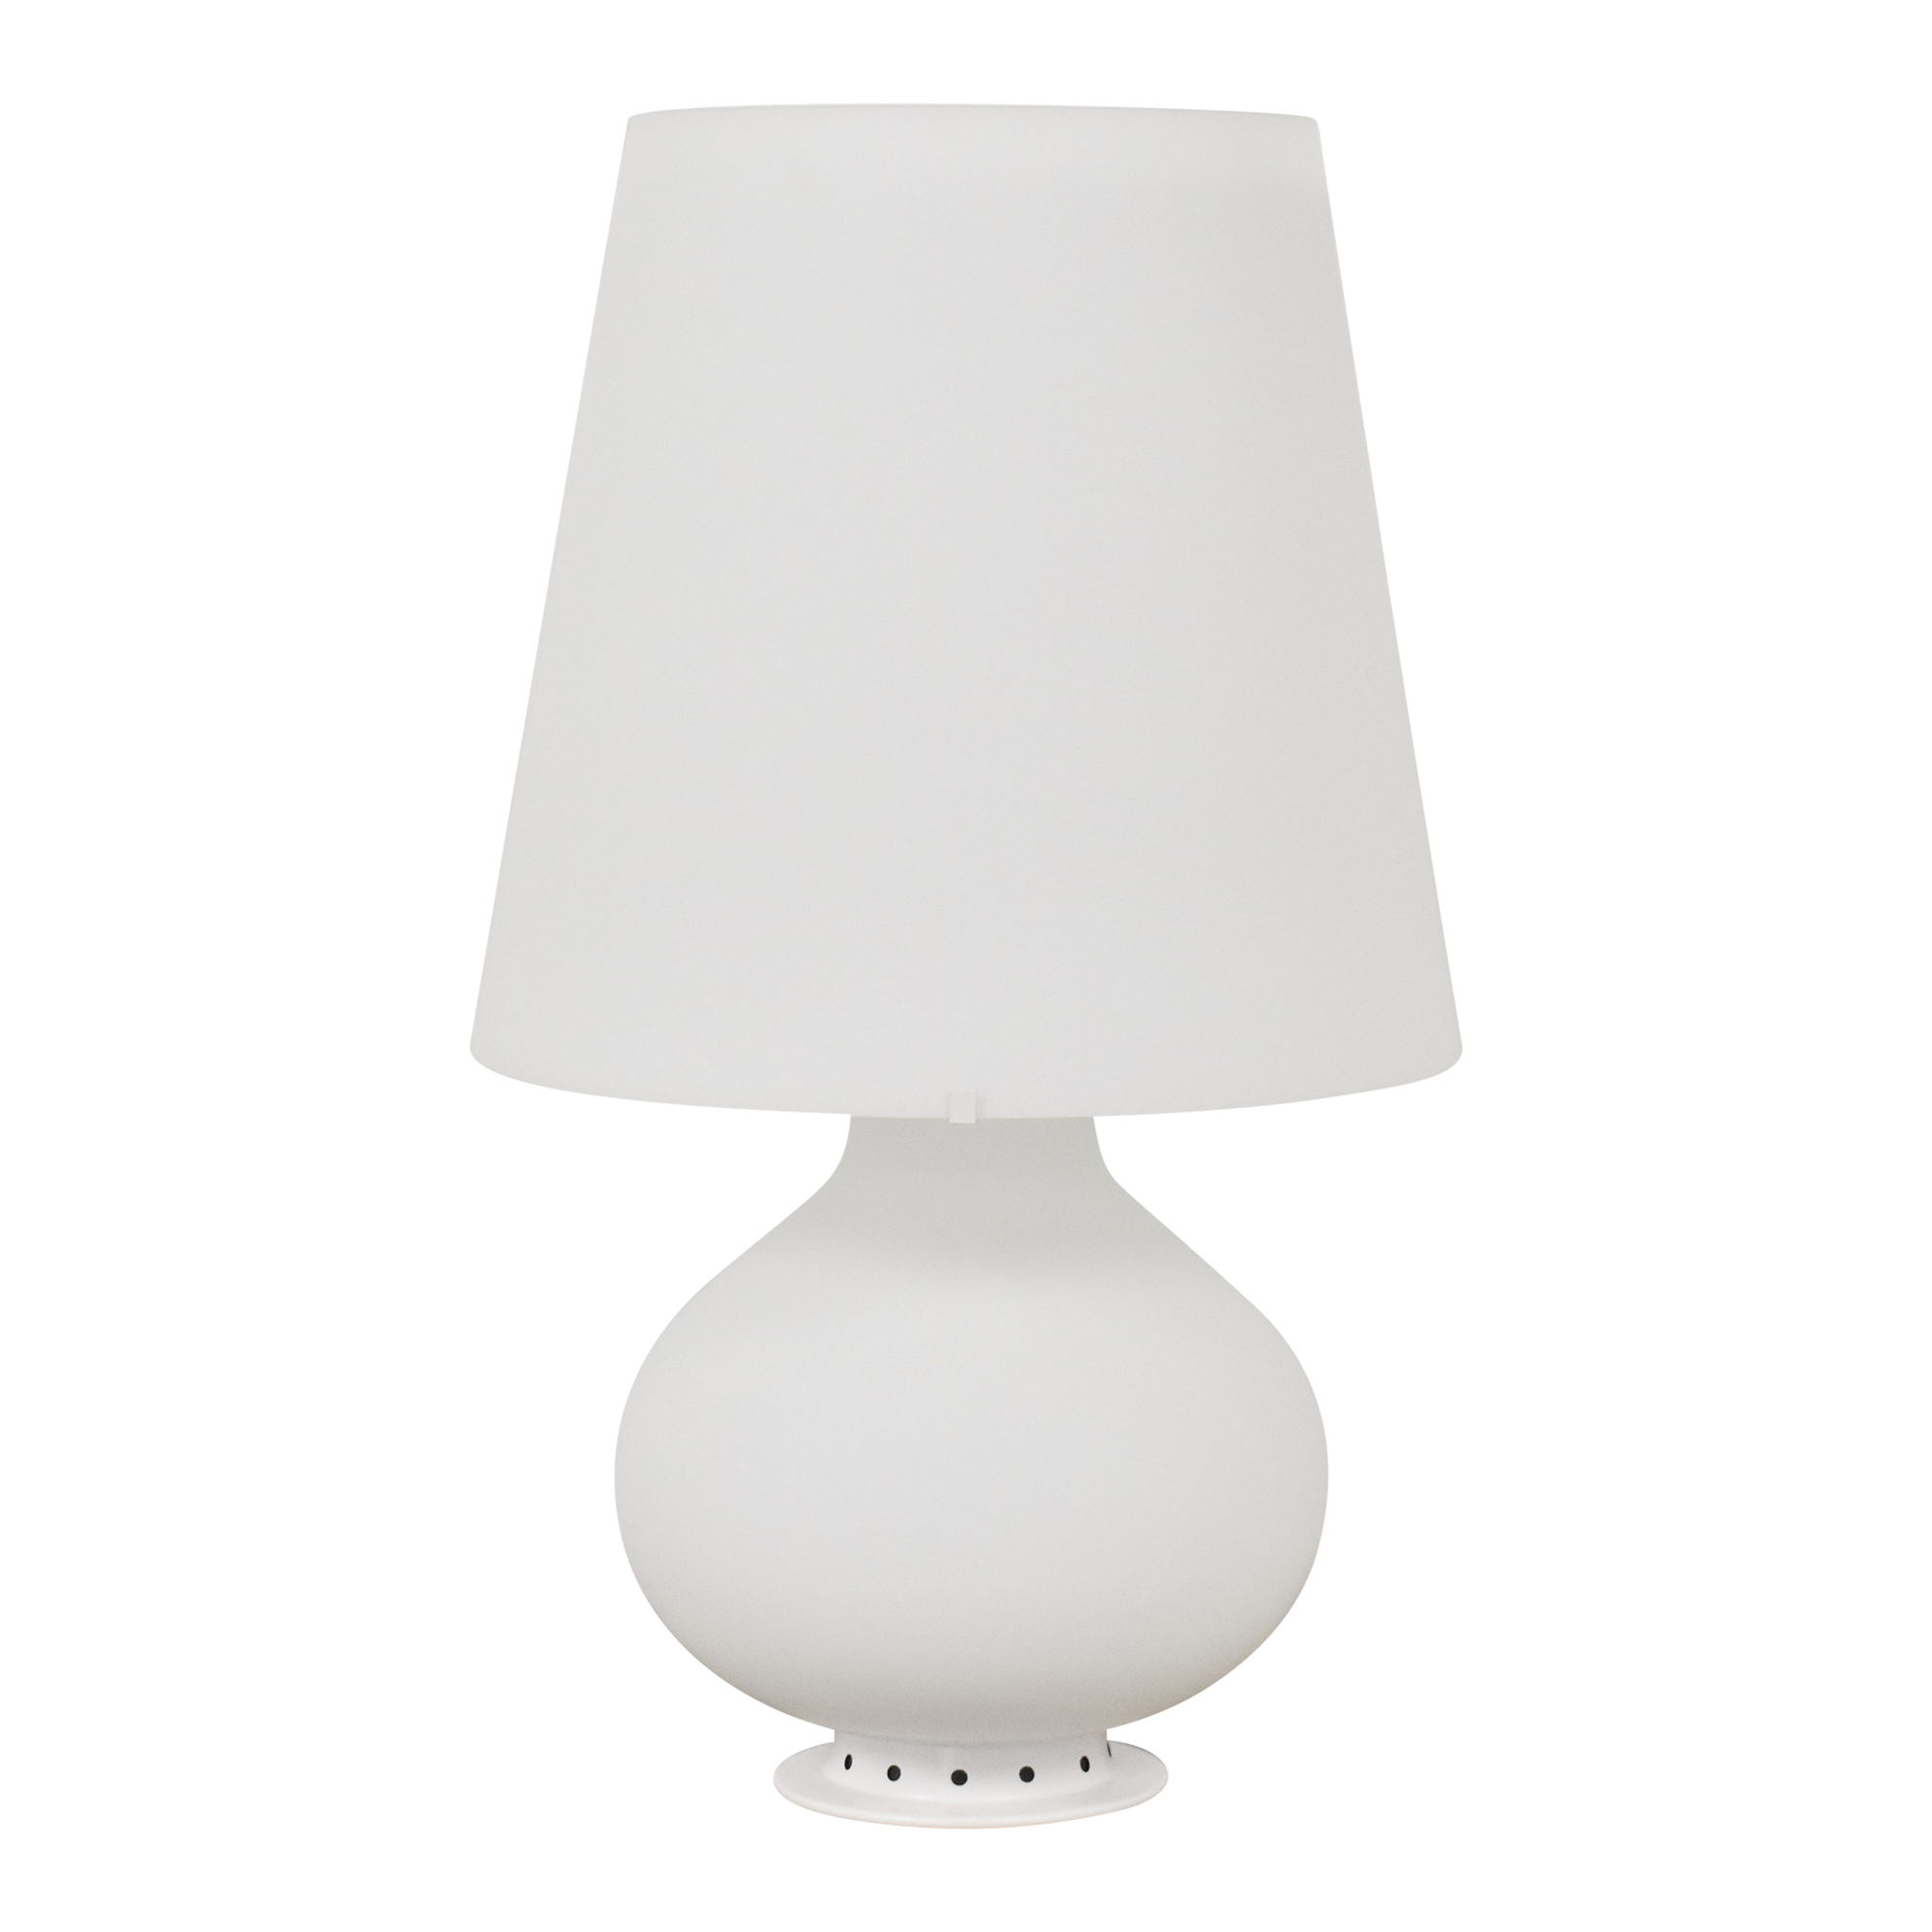 FontanaArte FontanaArte Fontana Large Table Lamp by Max Ingrand price